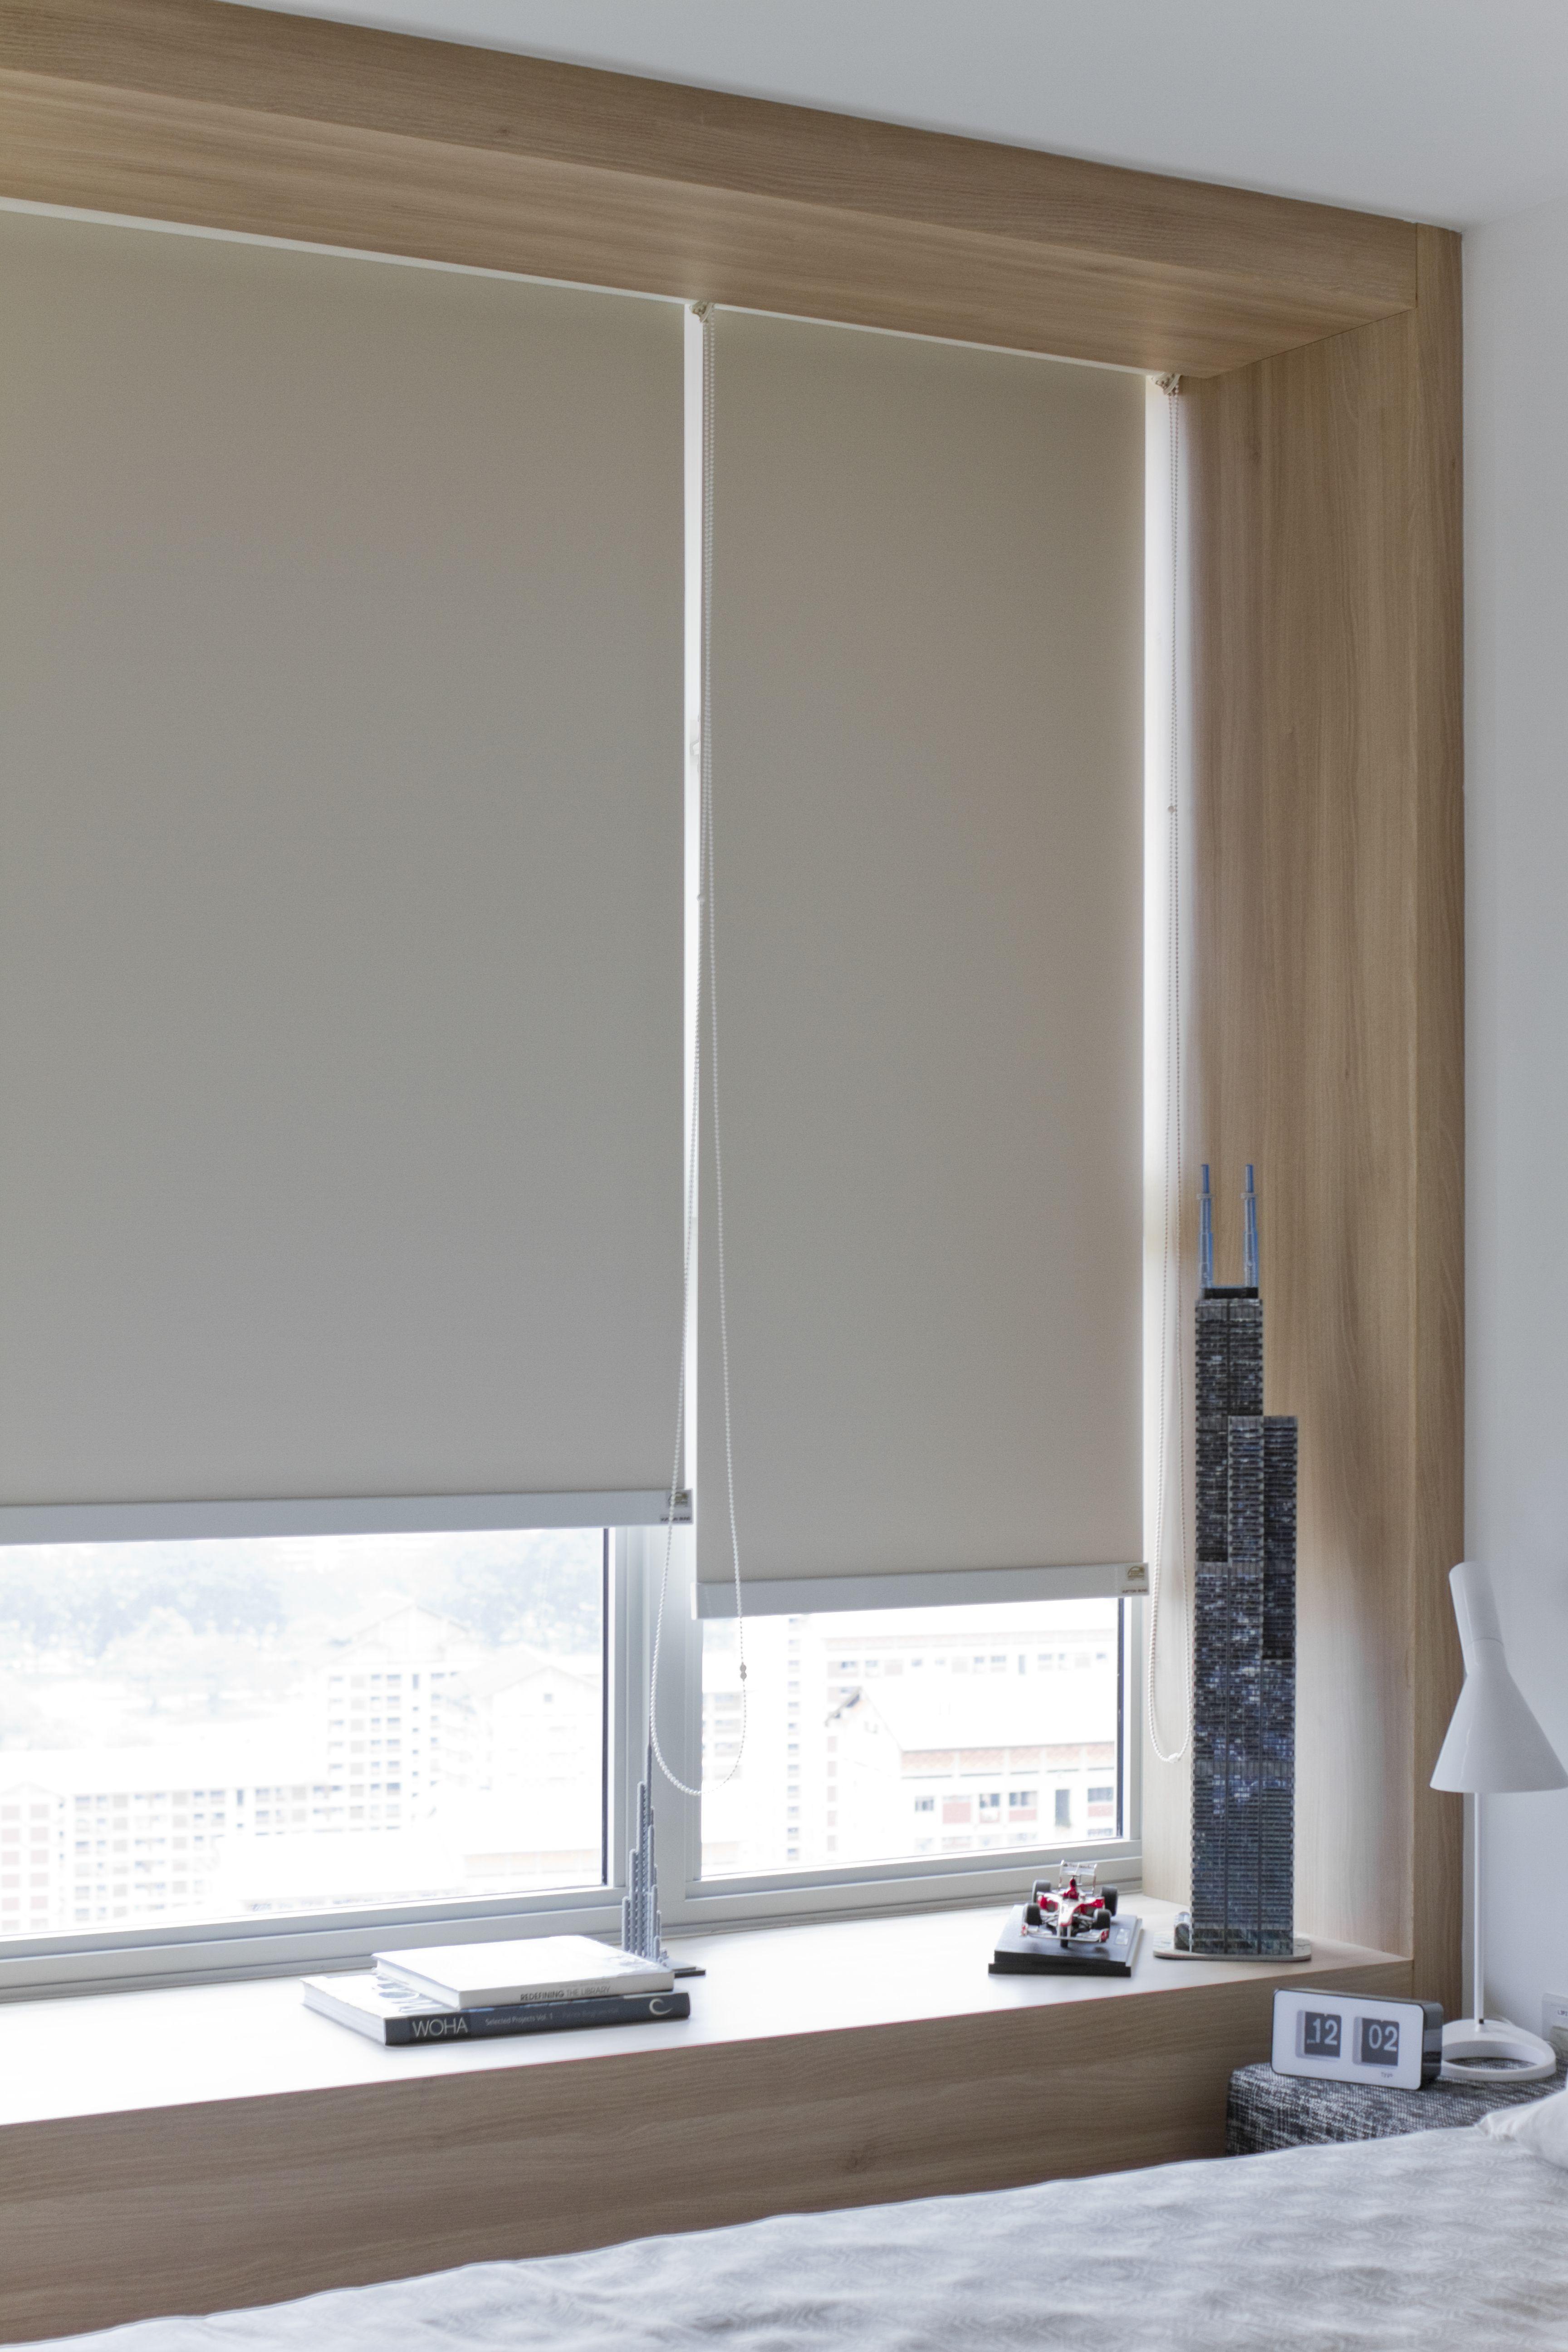 The bay window framing blocks away the perimeter framing of the ...